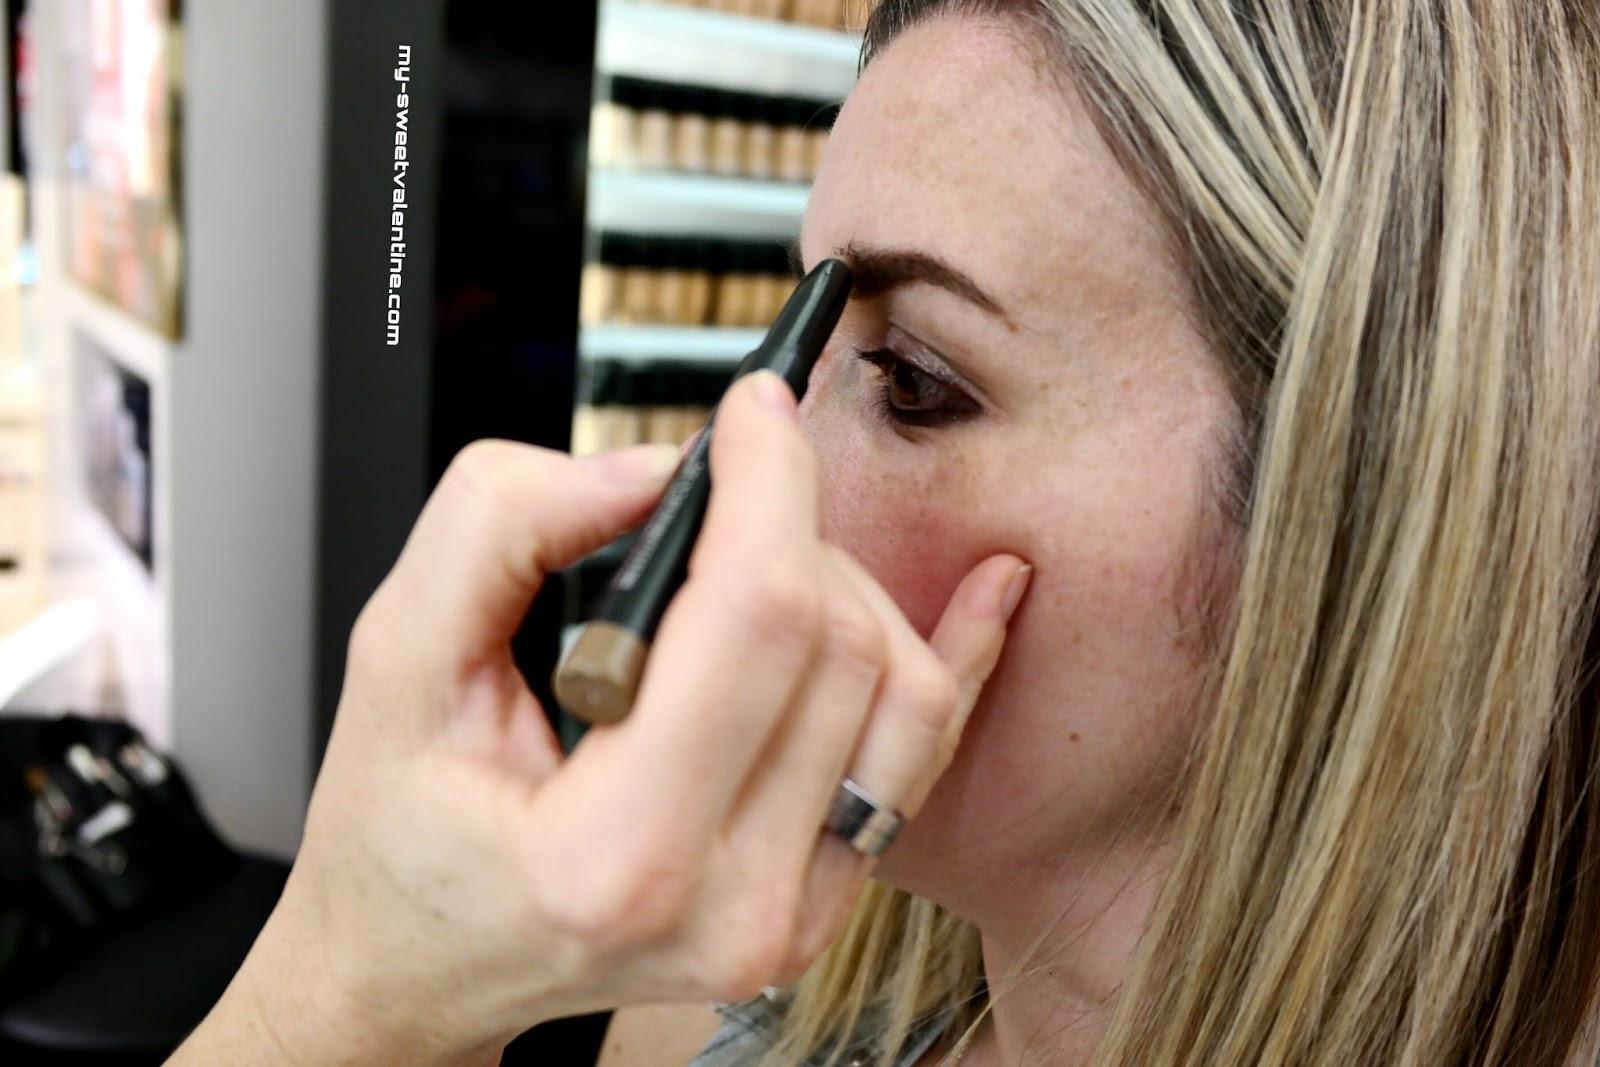 How To Use Mac Spiked Eyebrow Pencil The Eyebrow